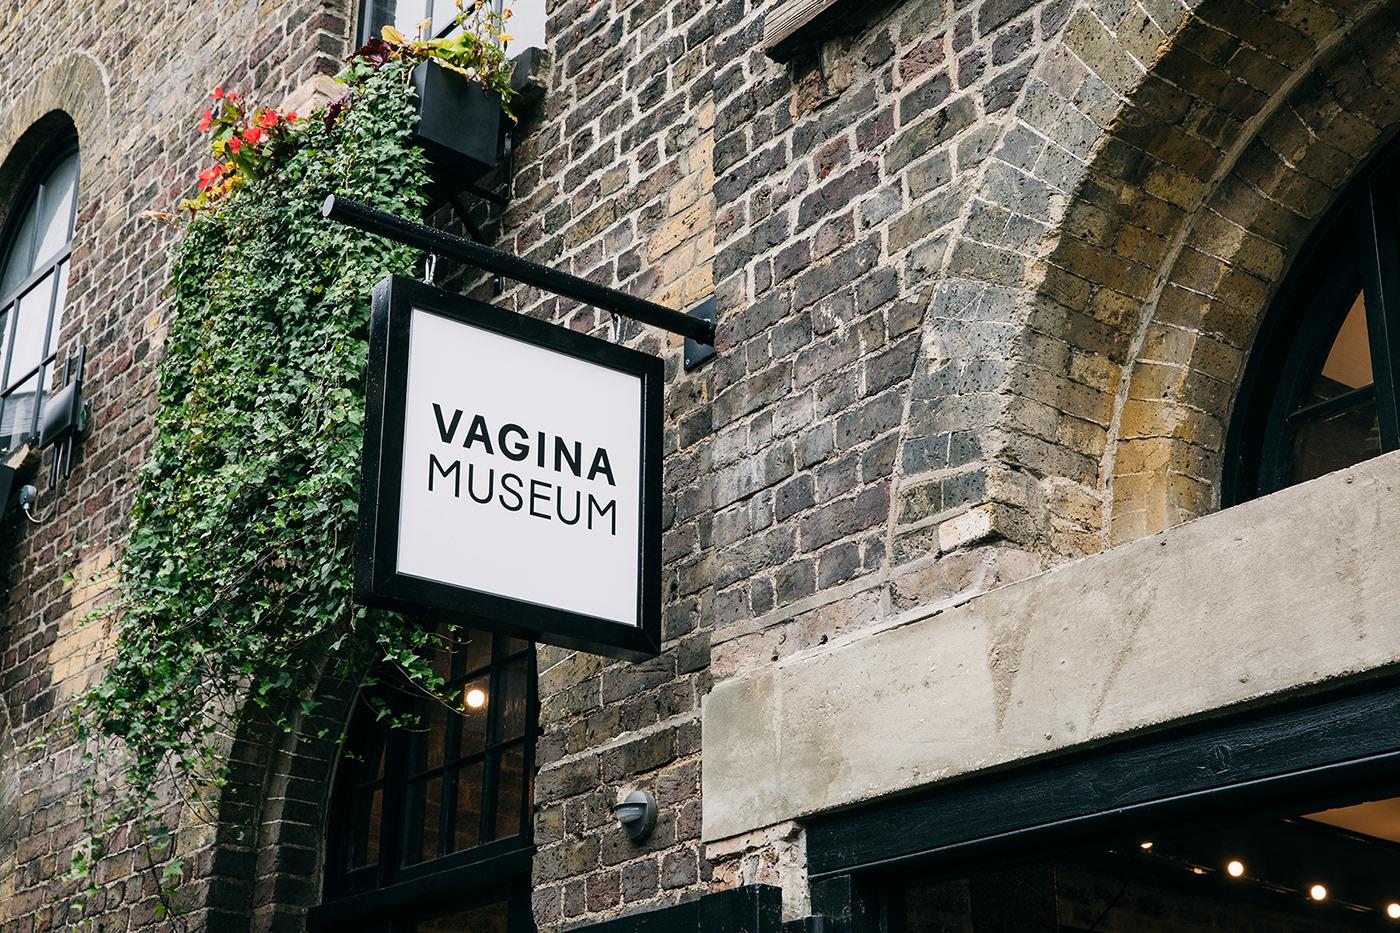 sex female museum feminist equality London Gender women woman feminism